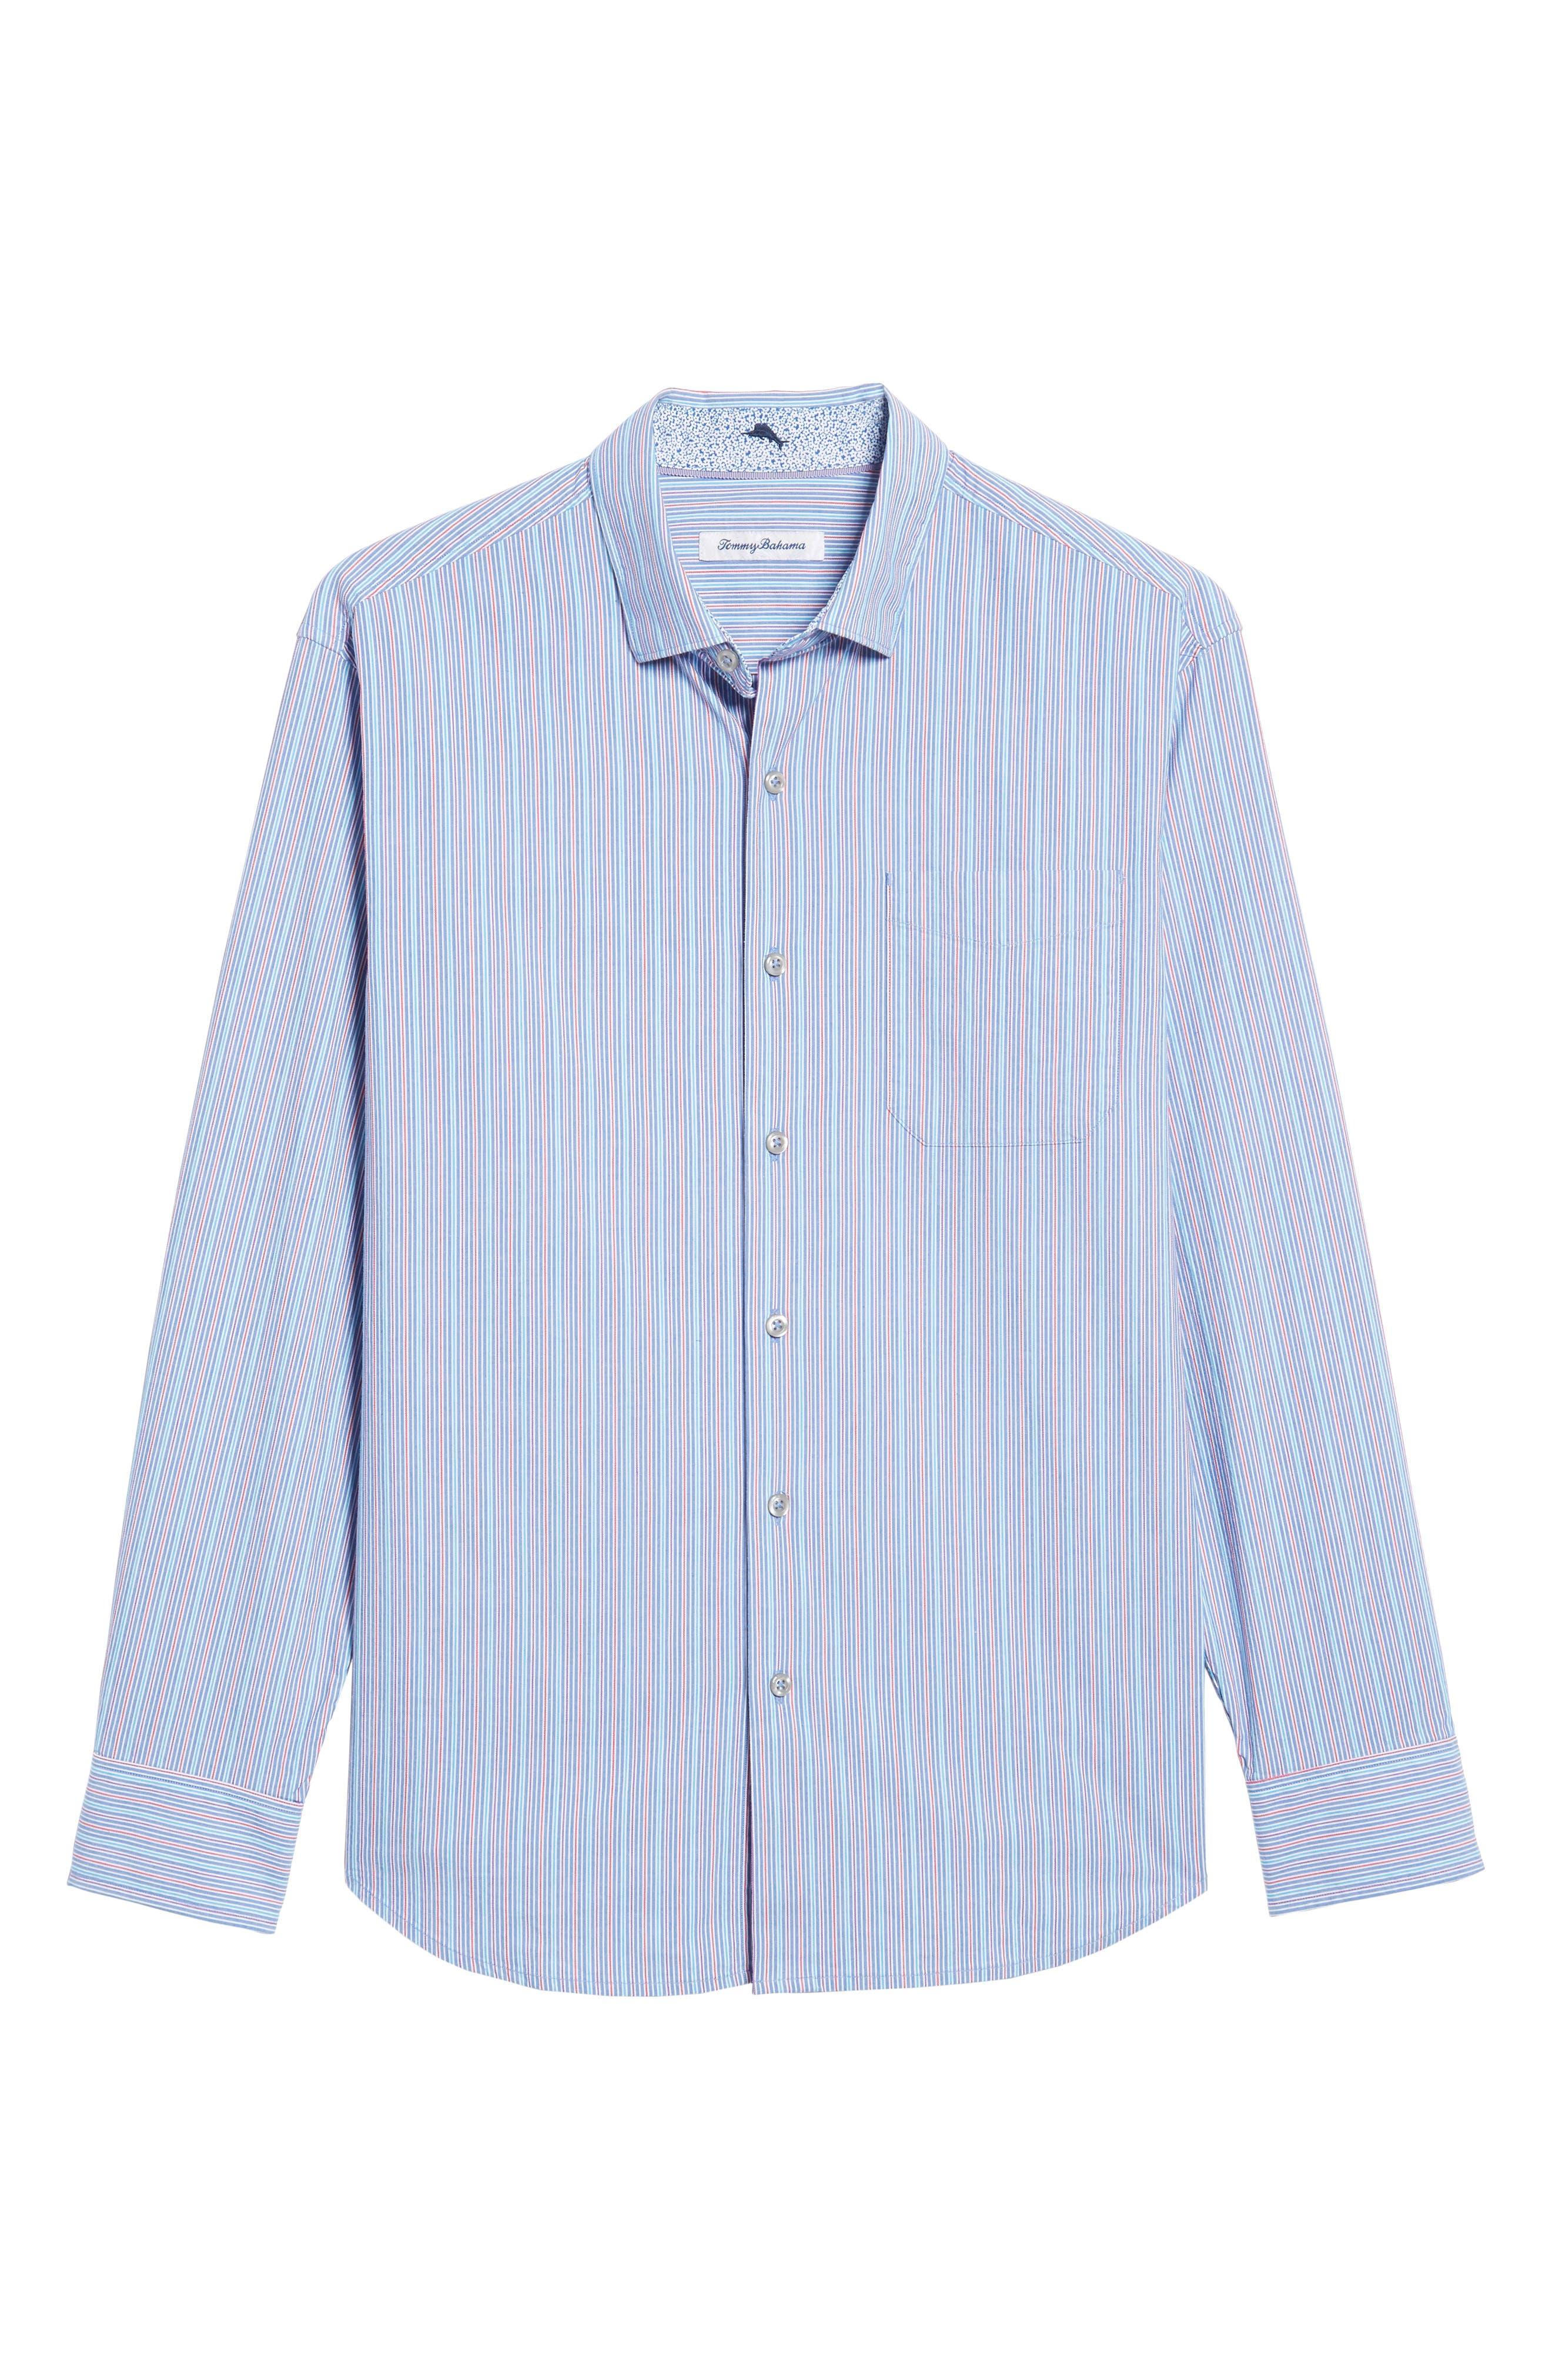 Tallahassee Cotton & Silk Blend Sport Shirt,                             Alternate thumbnail 6, color,                             Cobalt Sea